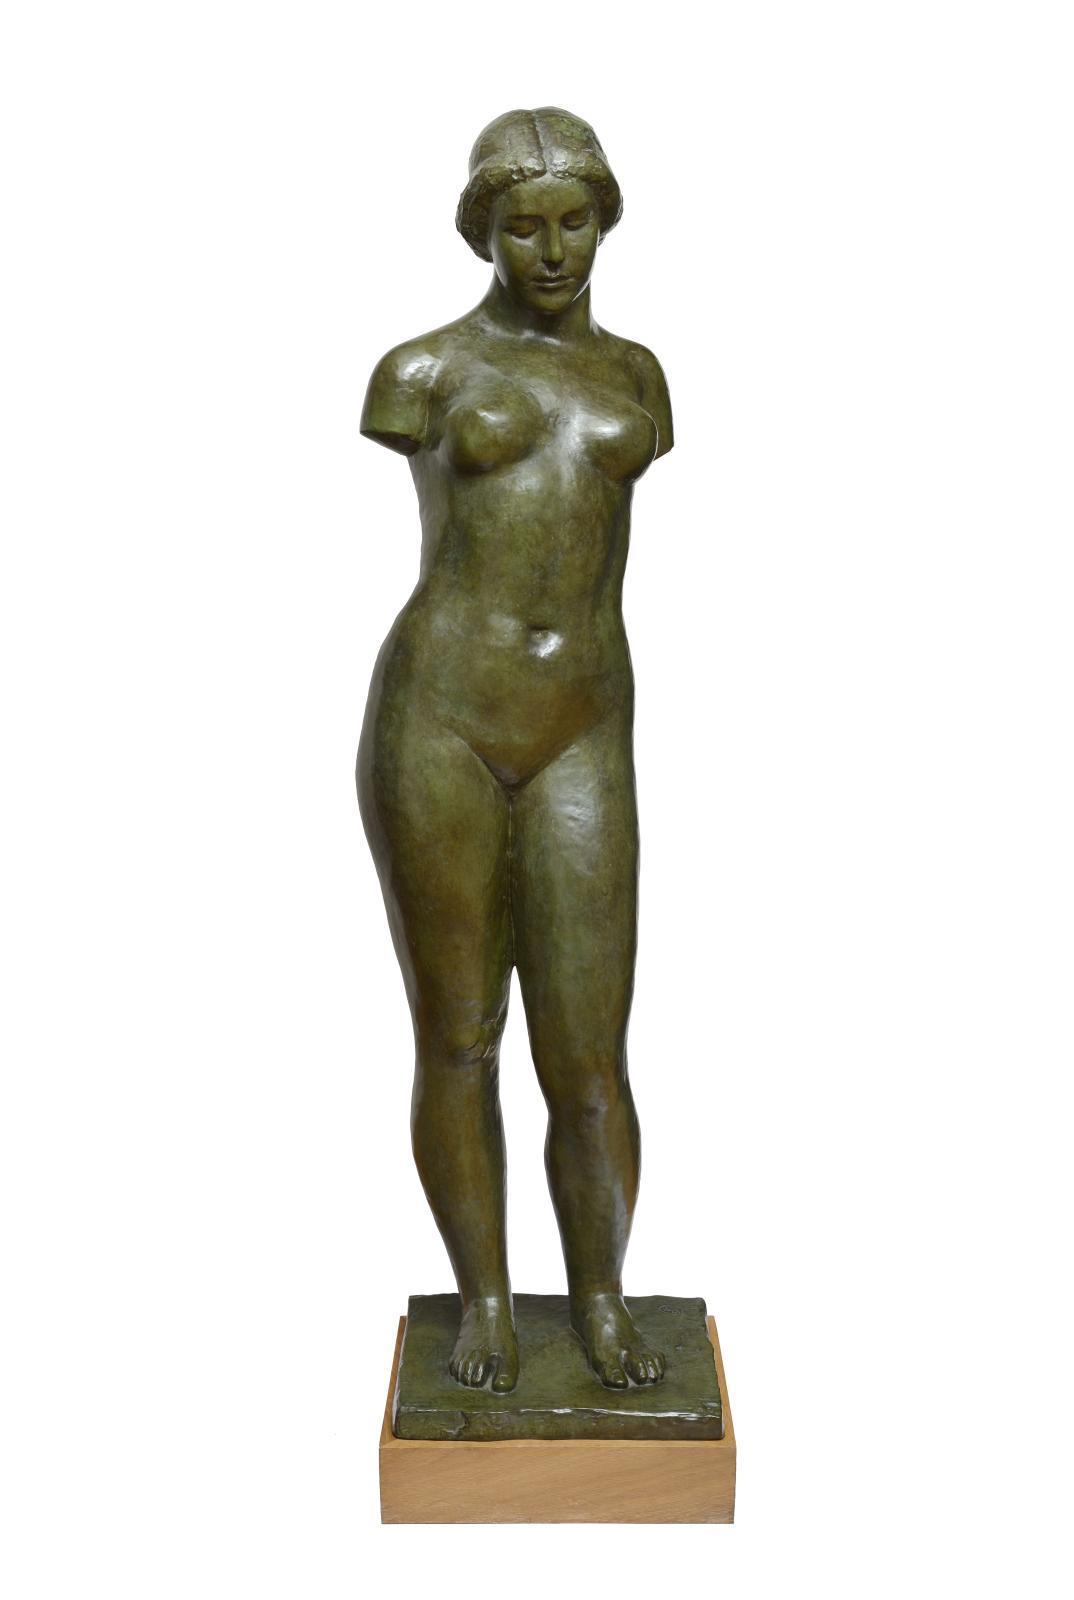 Aristide Maillol(1861-1944), Harmonie, 1erétat, 1940-1944, bronze, fonte Émile Godard, h.155cm.